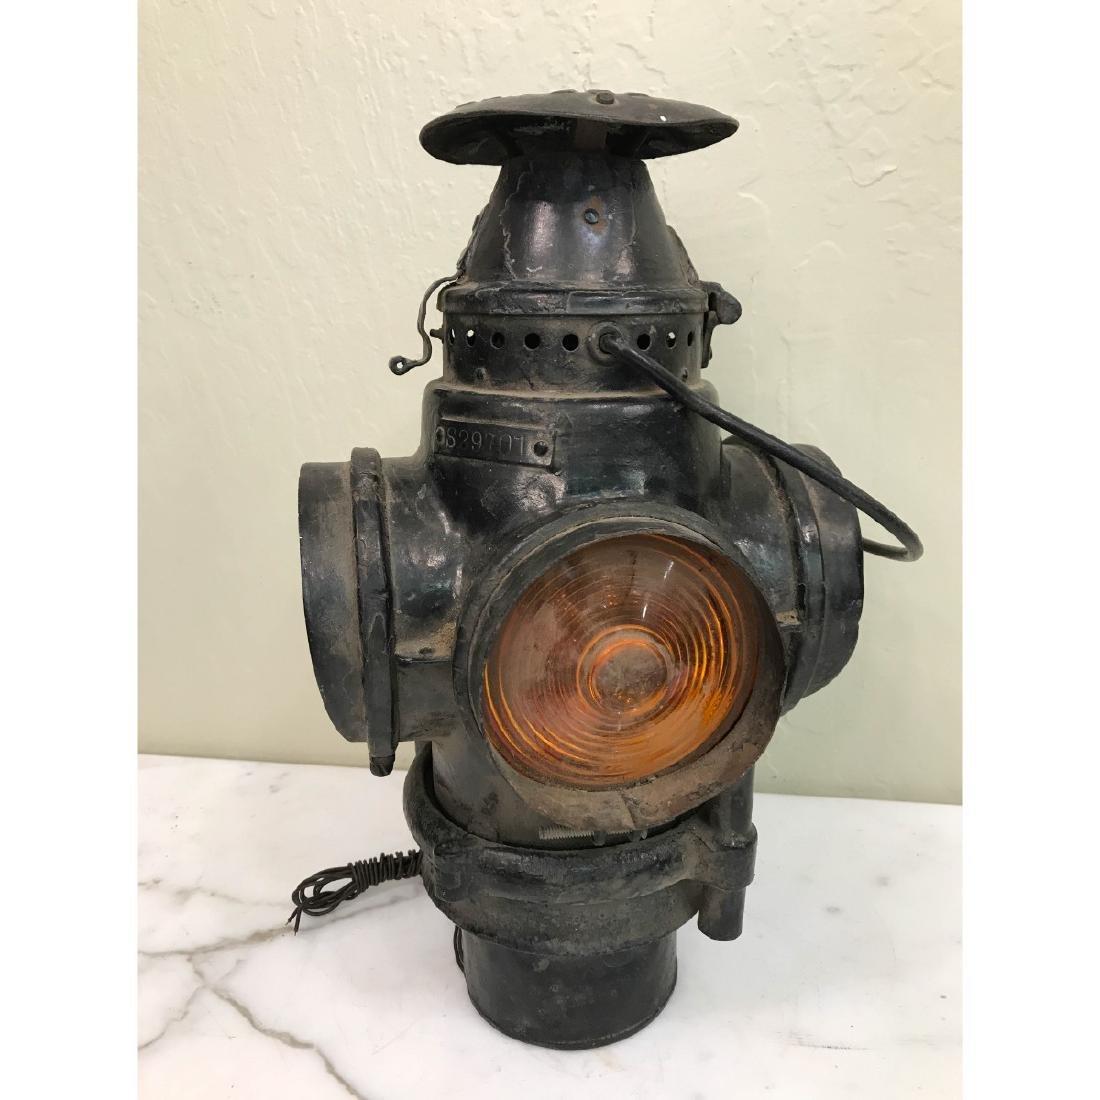 Antique Trunk Lamp, Lantern - 2